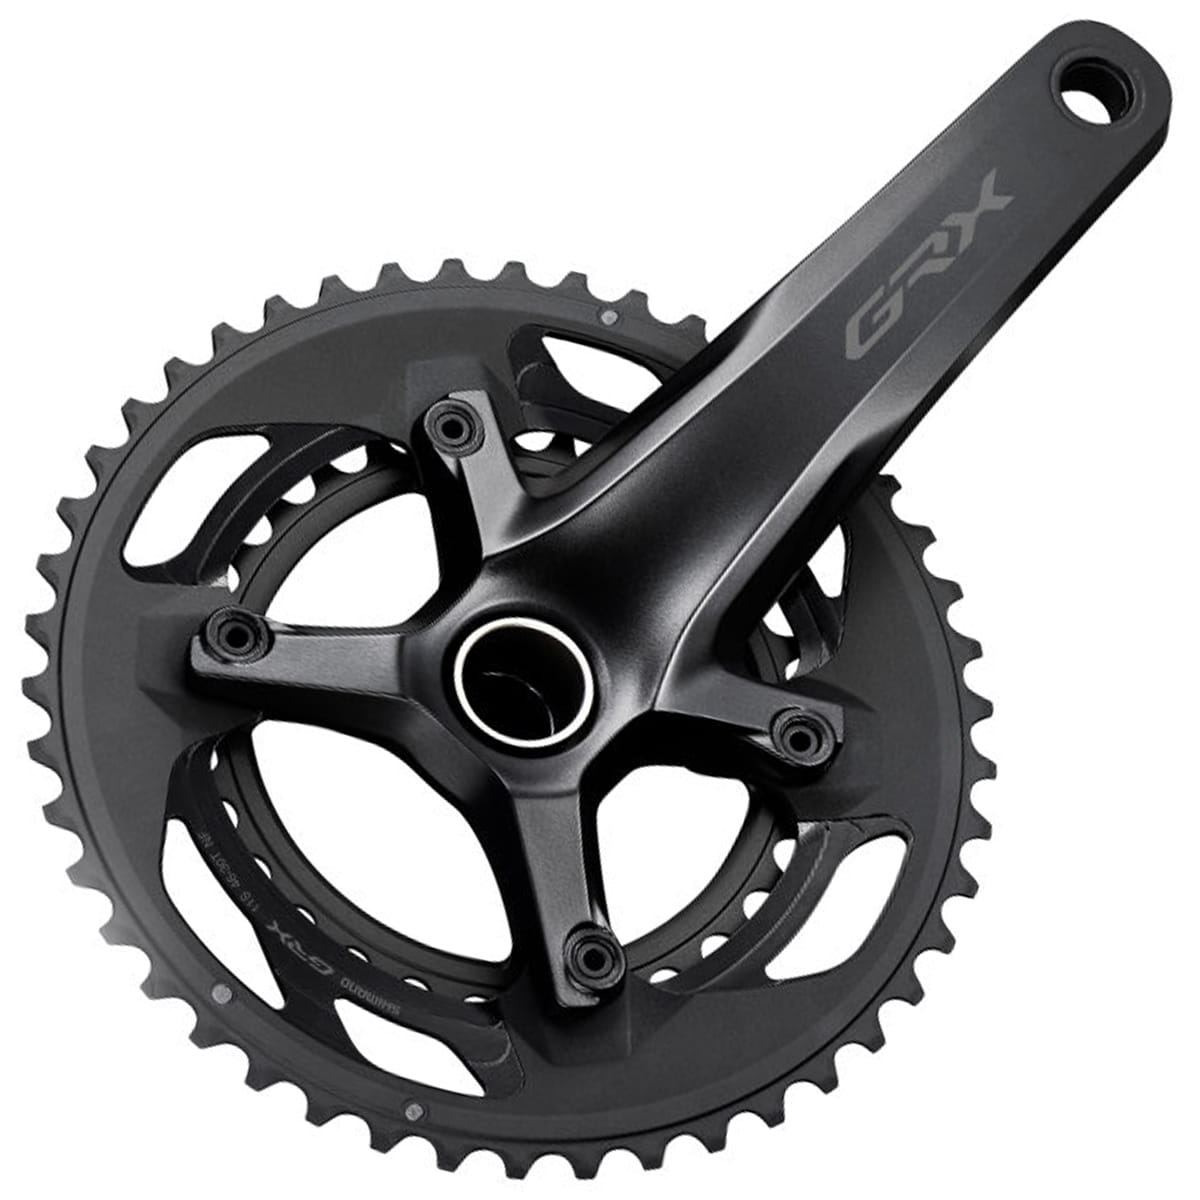 SHIMANO 2X11-Speed Road Bicycle Crankset FC-RX600-11